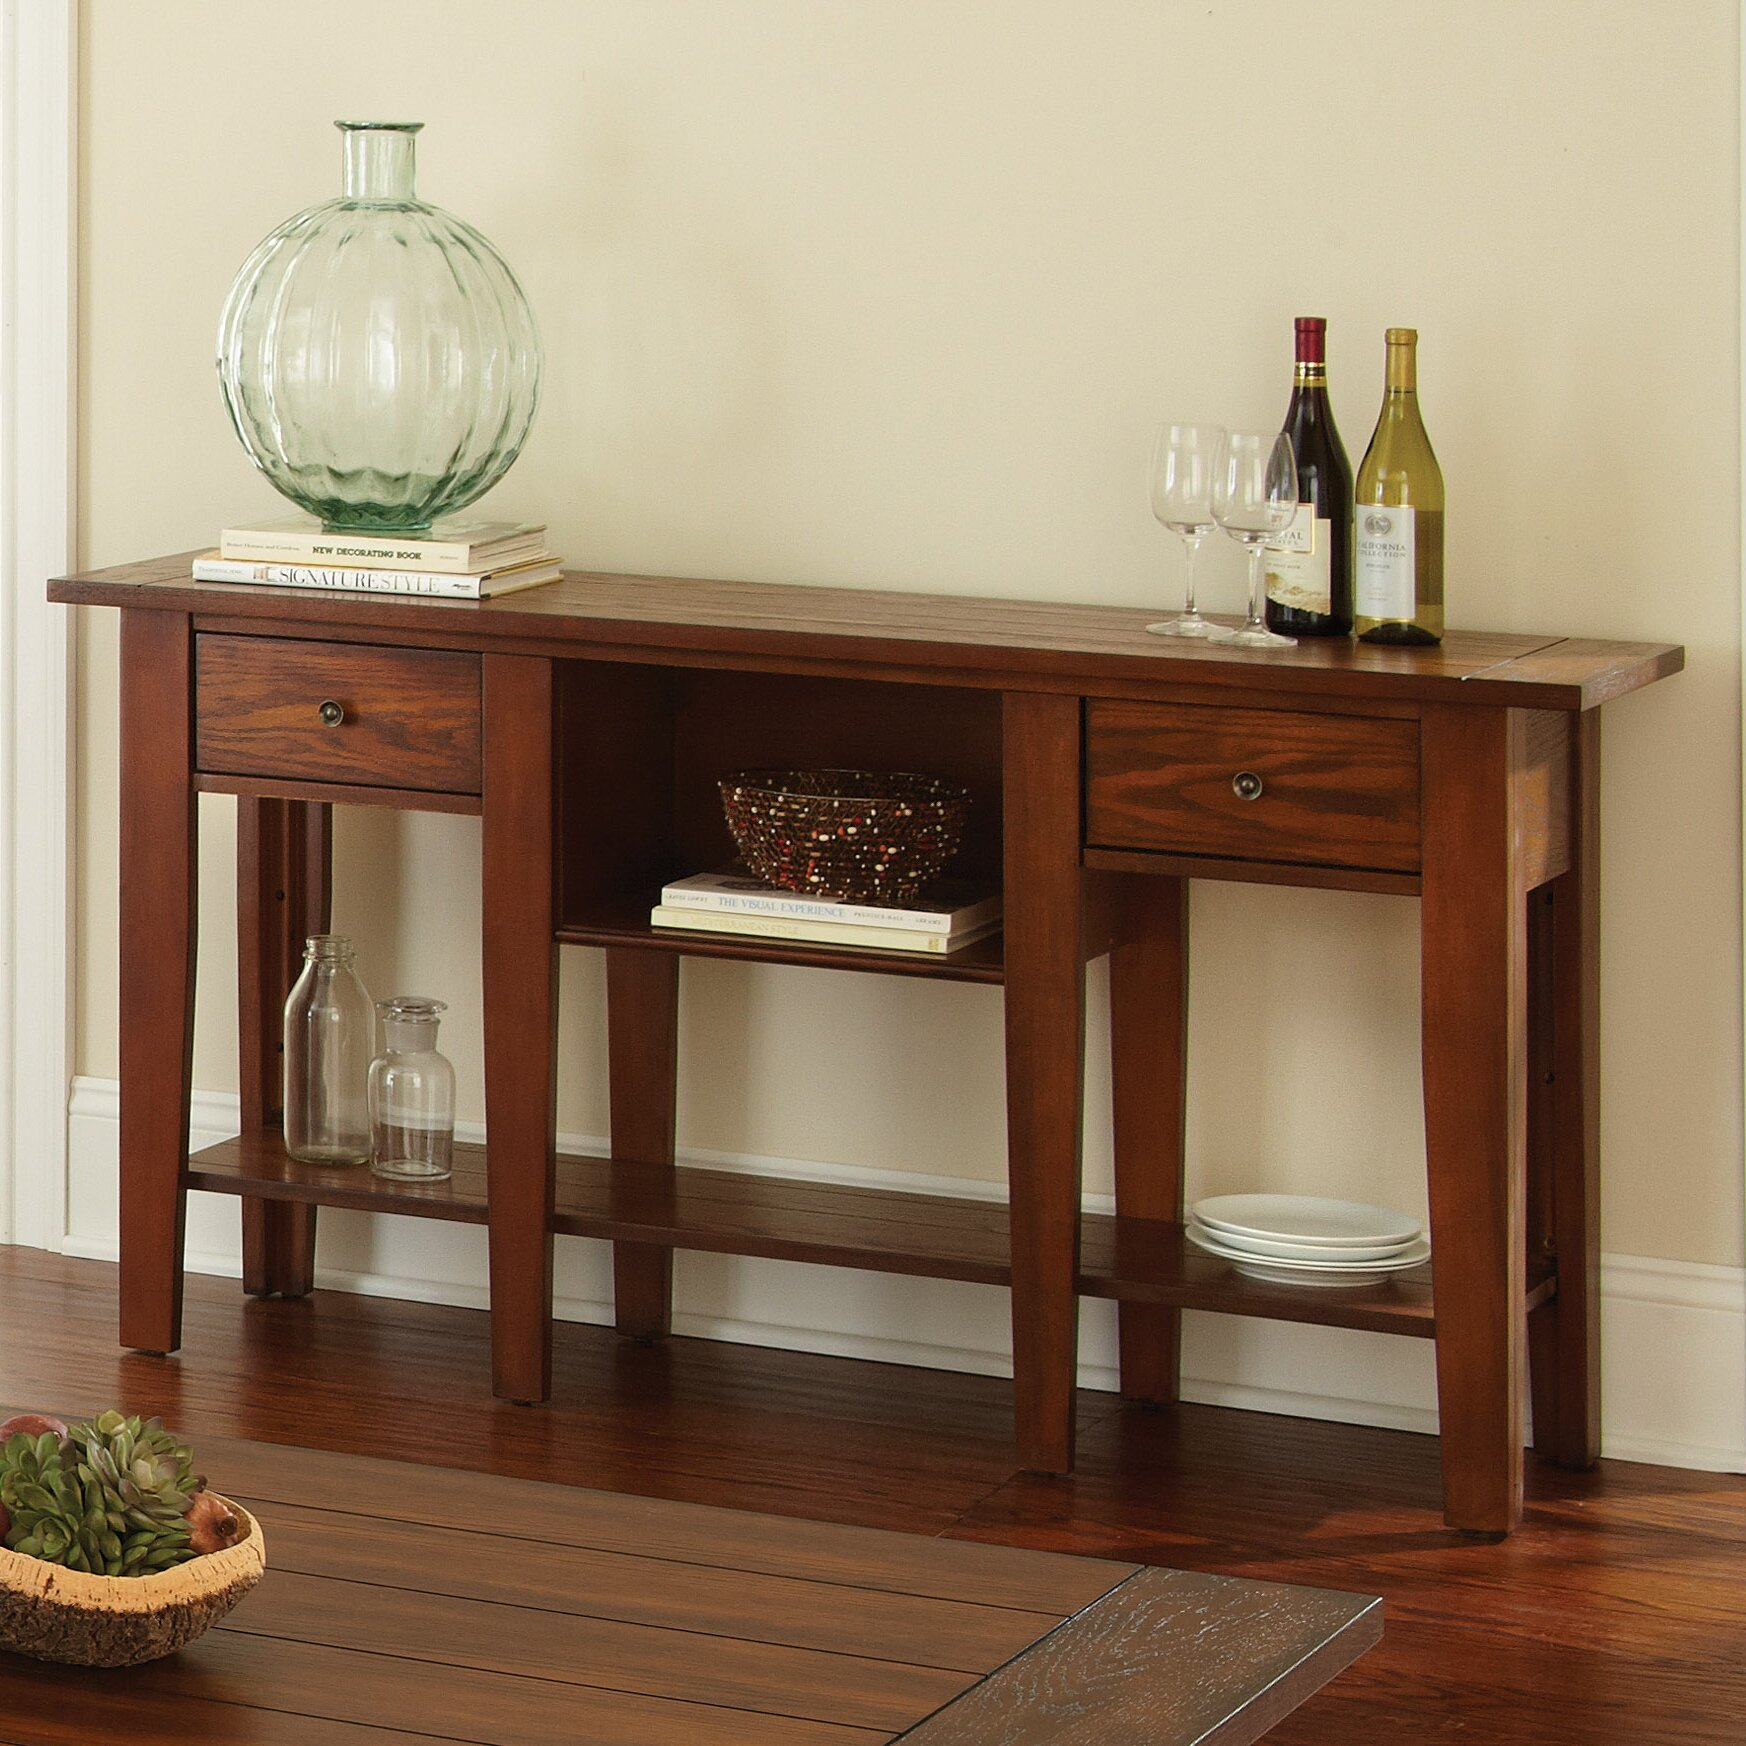 Red Barrel Studio 4 Piece Coffee Table Set Reviews Wayfair